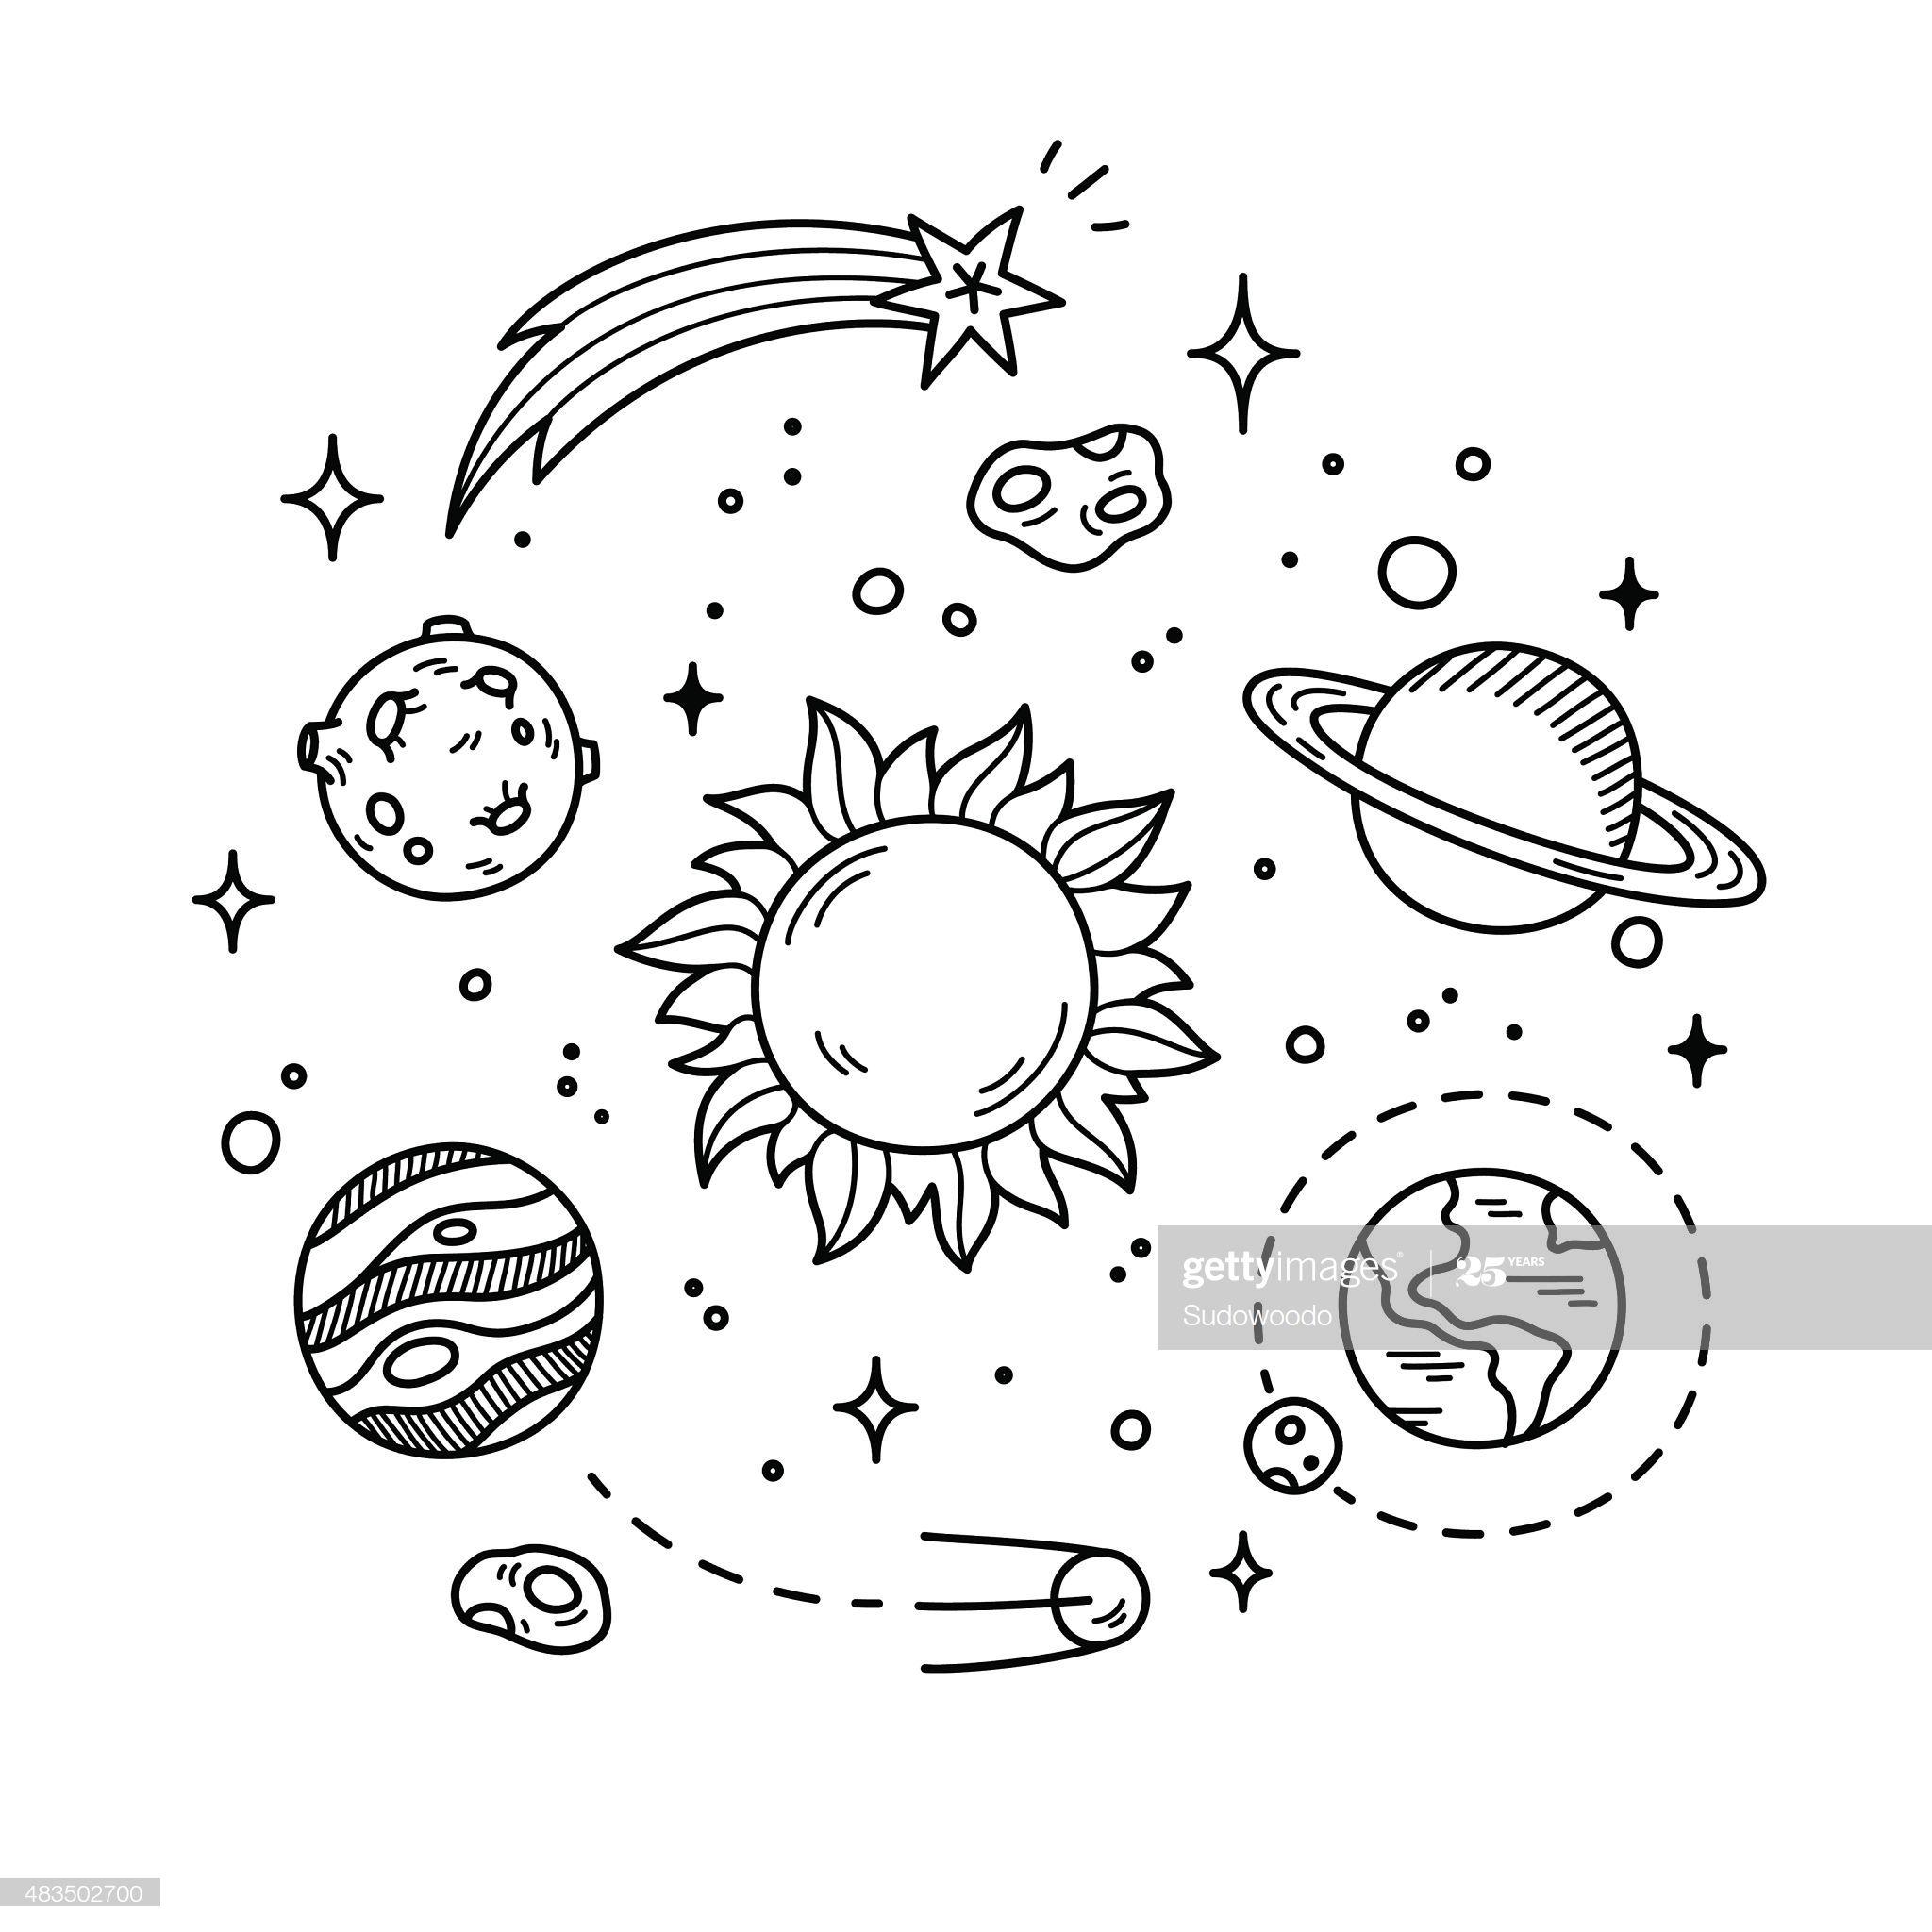 59c25c723fb3b0fa446406f8bf3524a5 » Easy Space Drawing